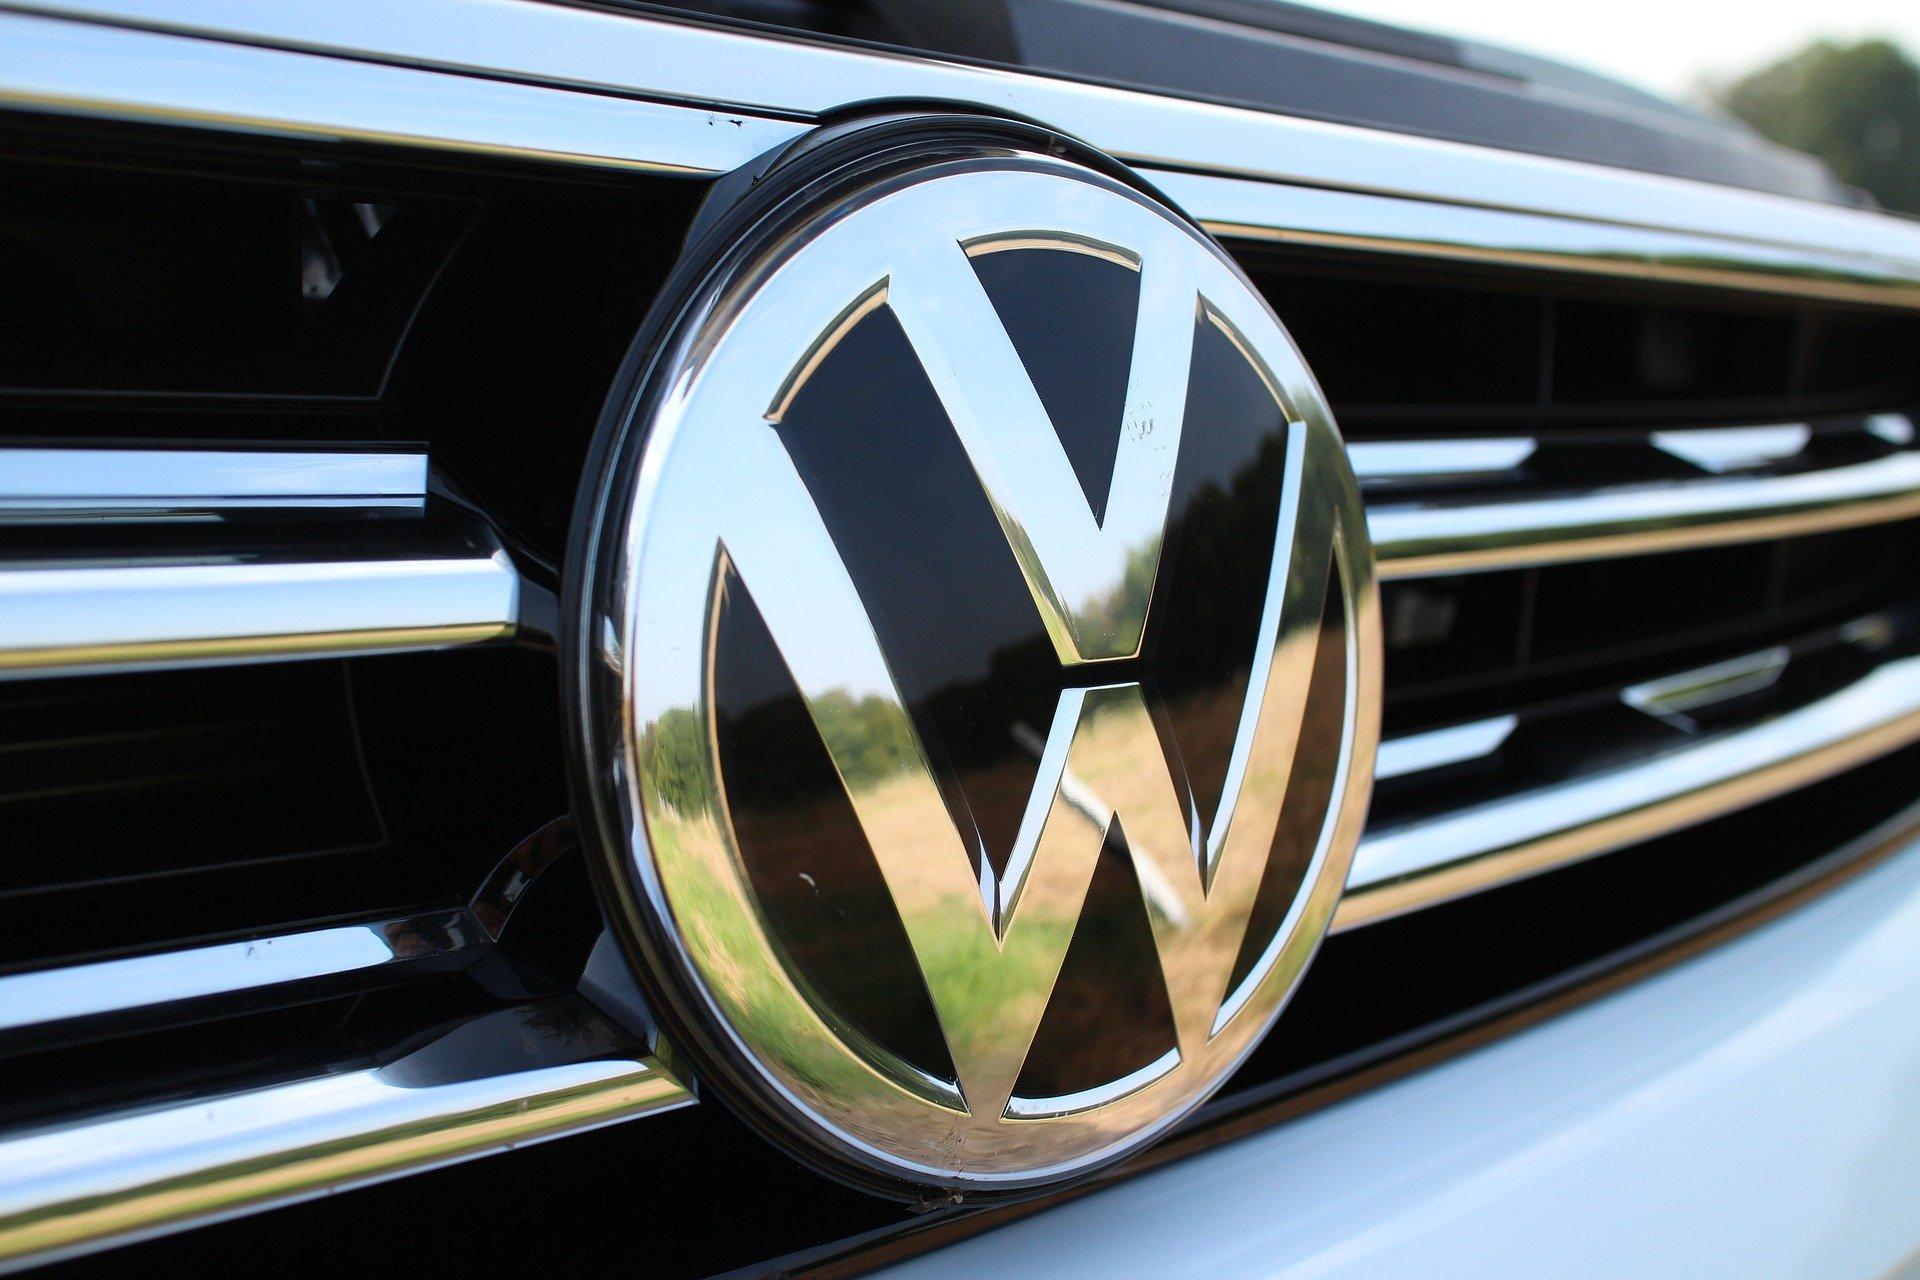 VolkswagenVehicle Locksmith Service